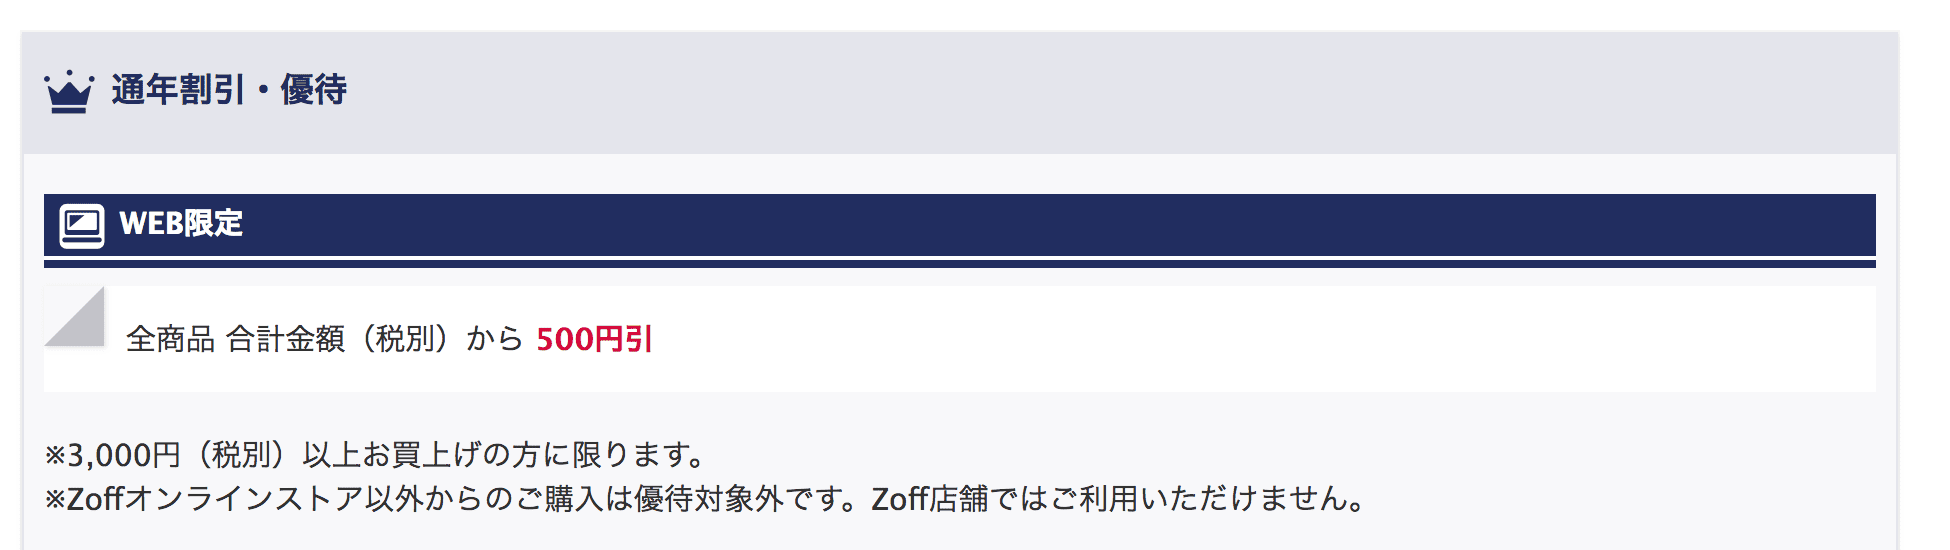 zoff-jaf